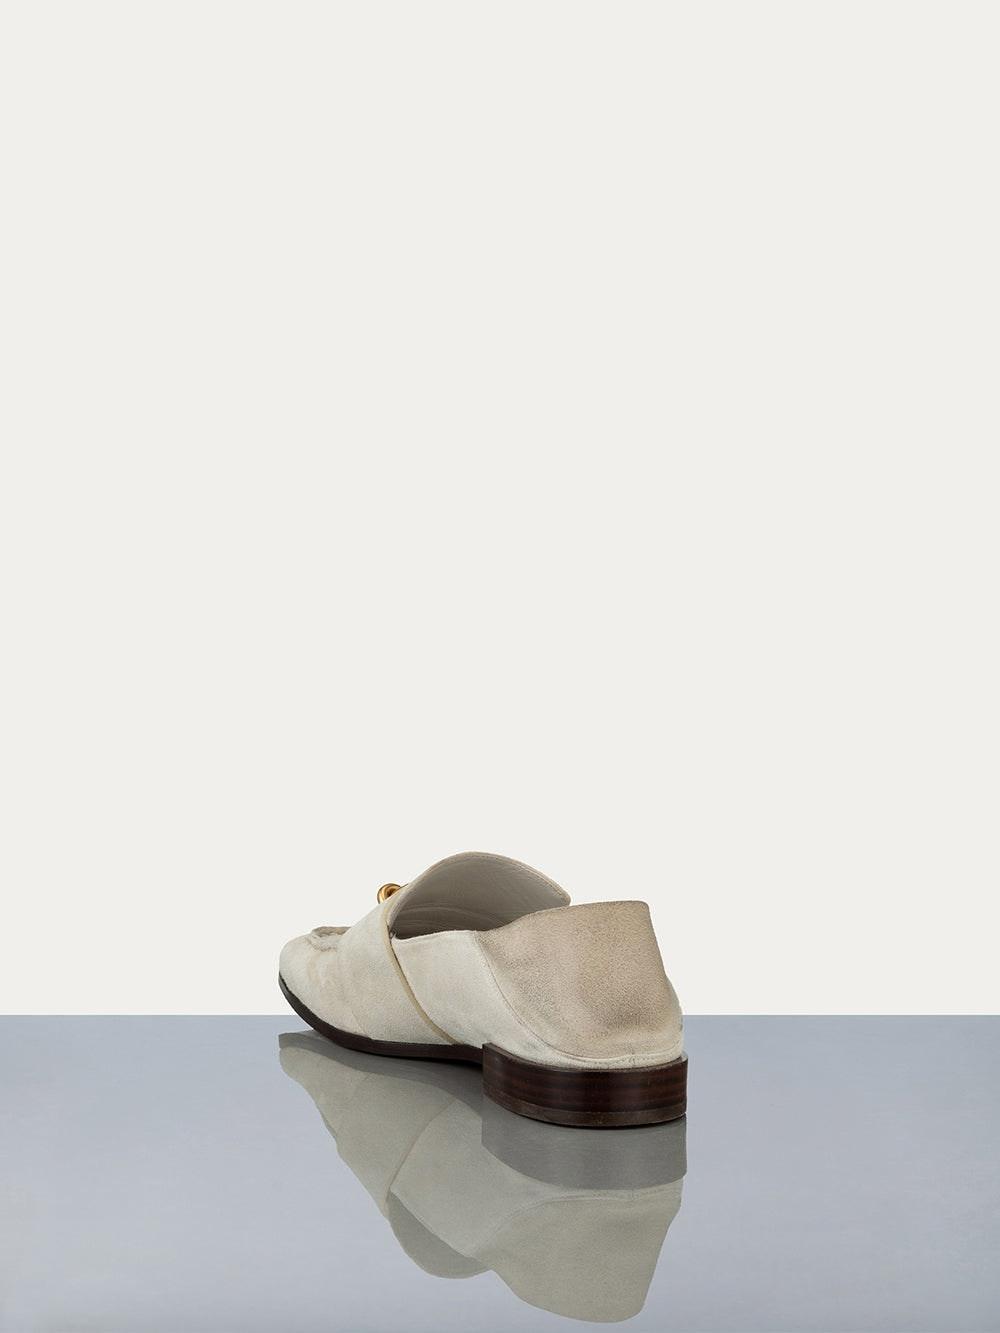 shoe back view